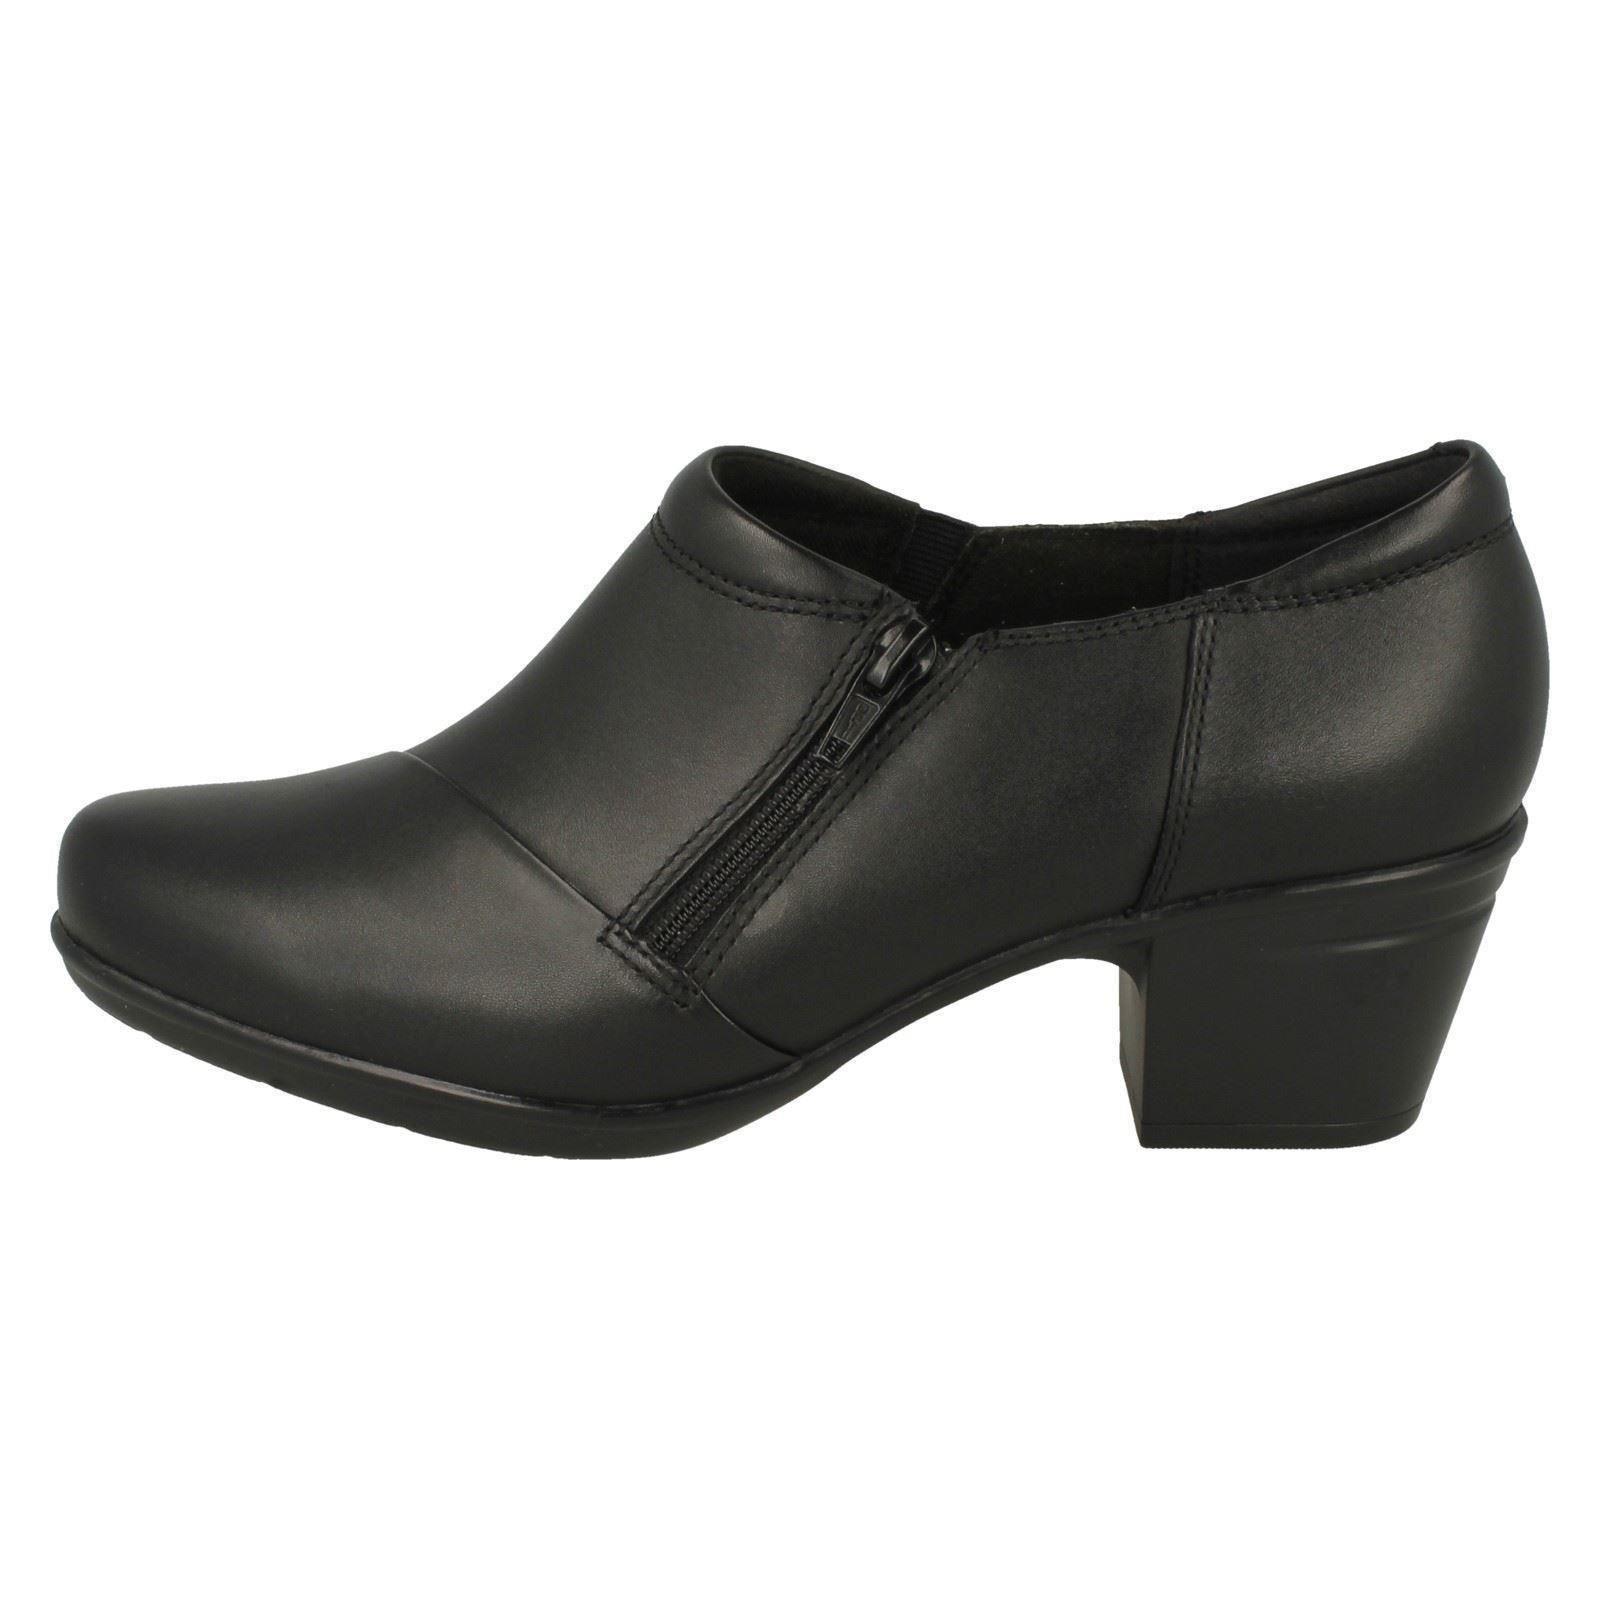 Ladies Smart Trouser Zip Up Block Heeled Leather Shoes Emslie Claudia